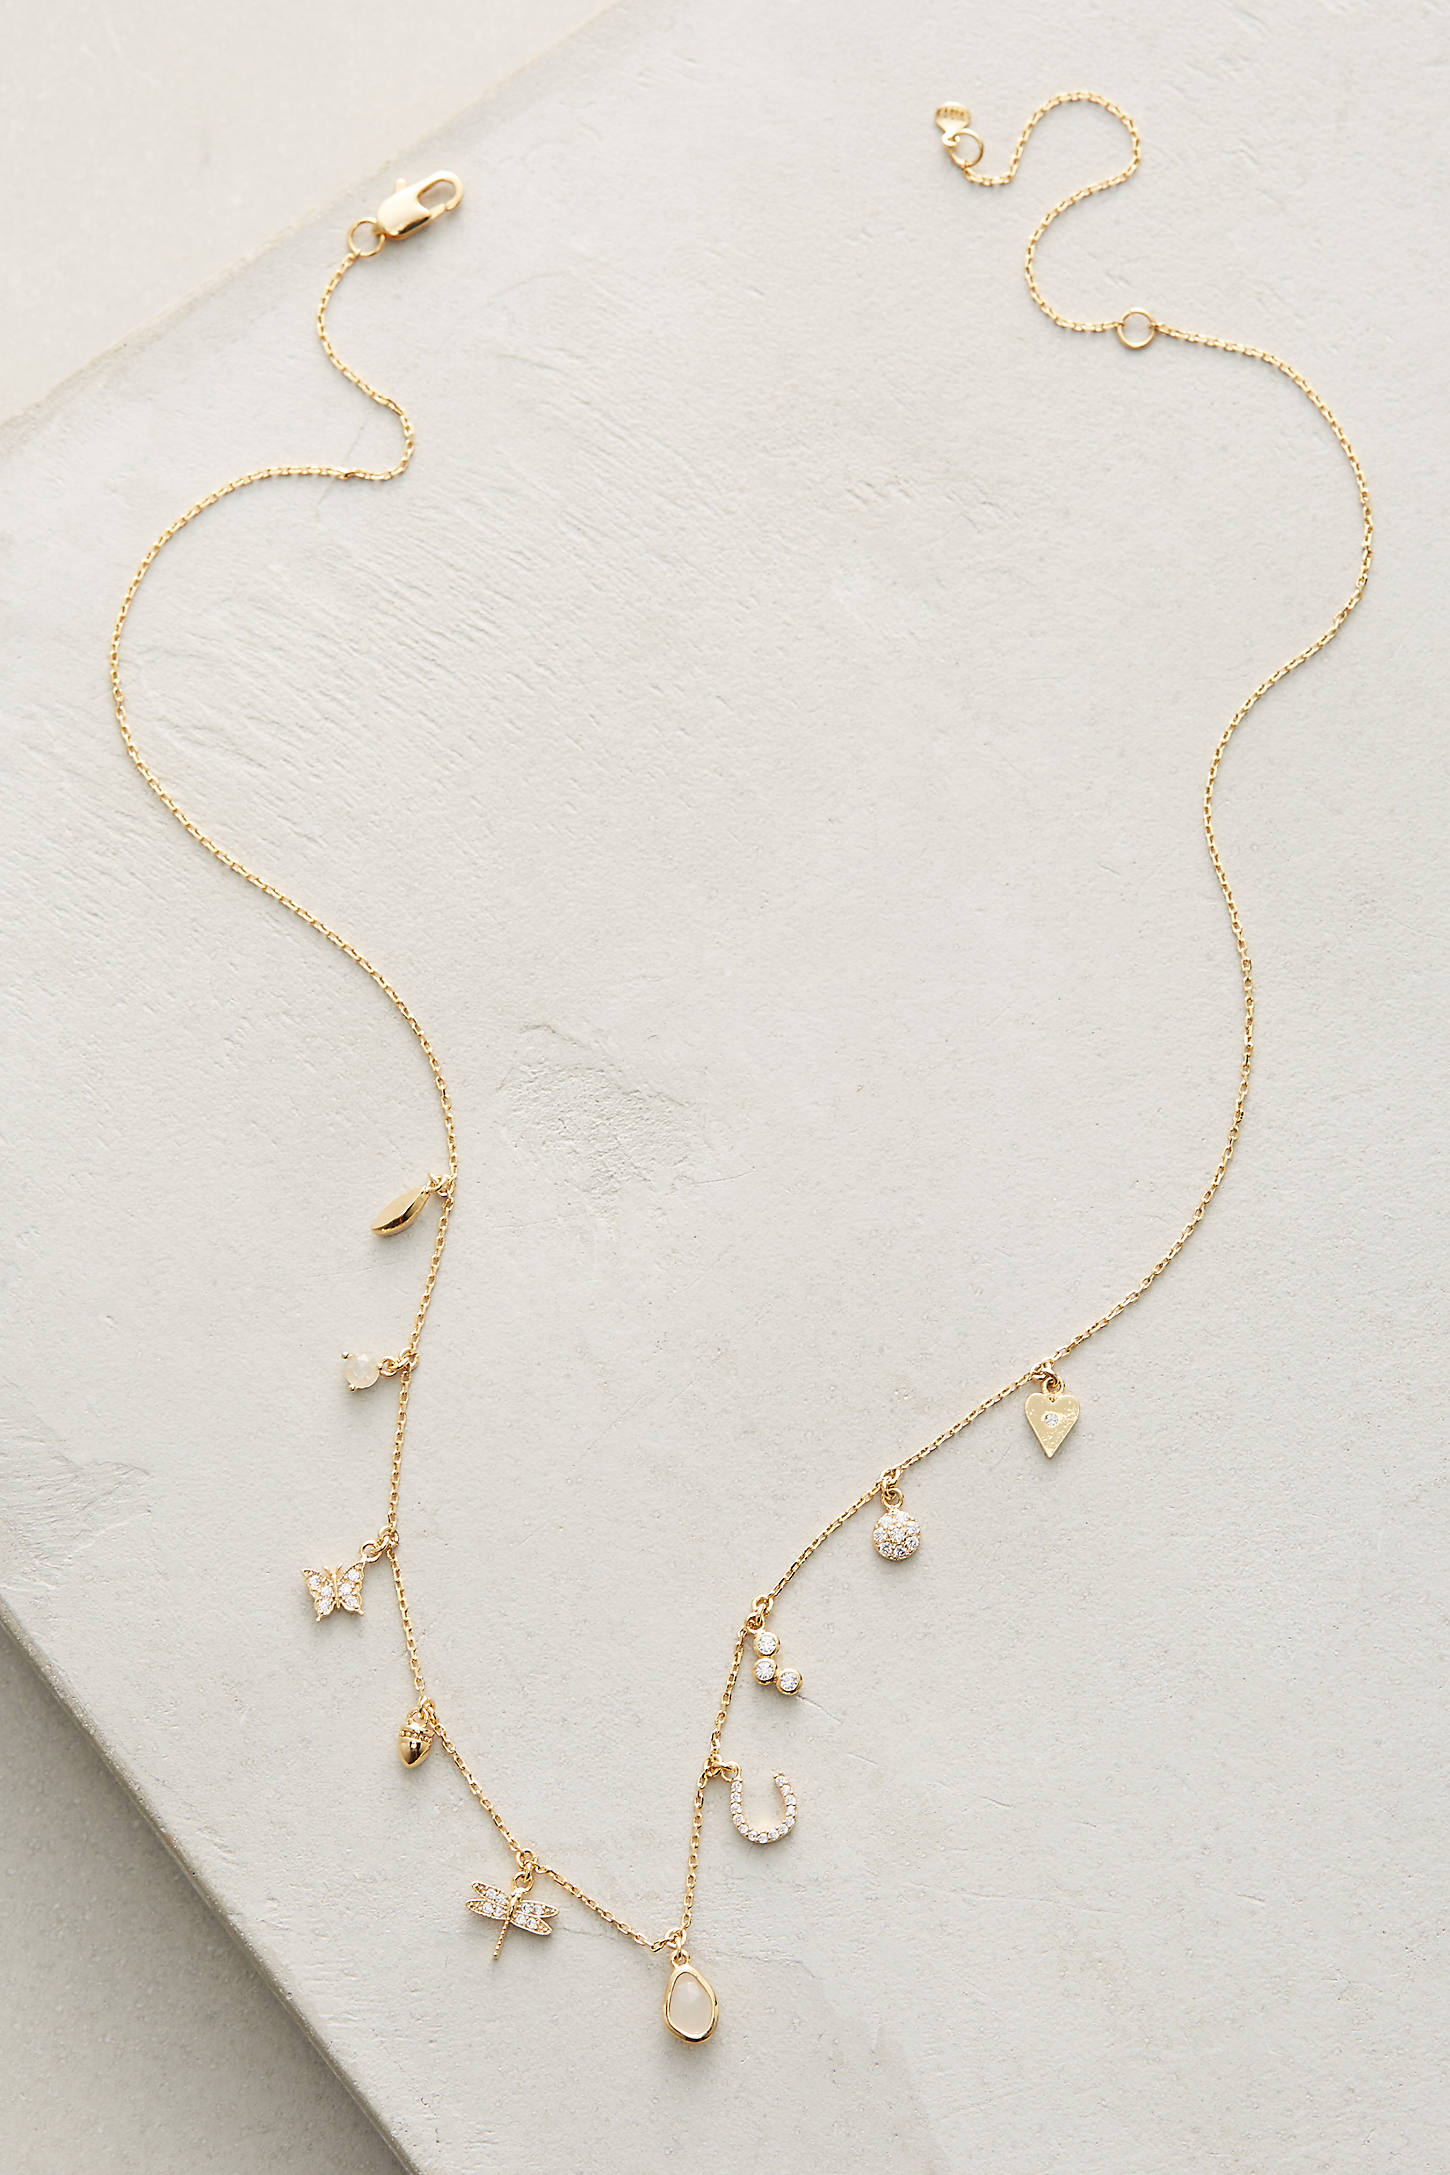 Key & Cosmos Charm Necklace